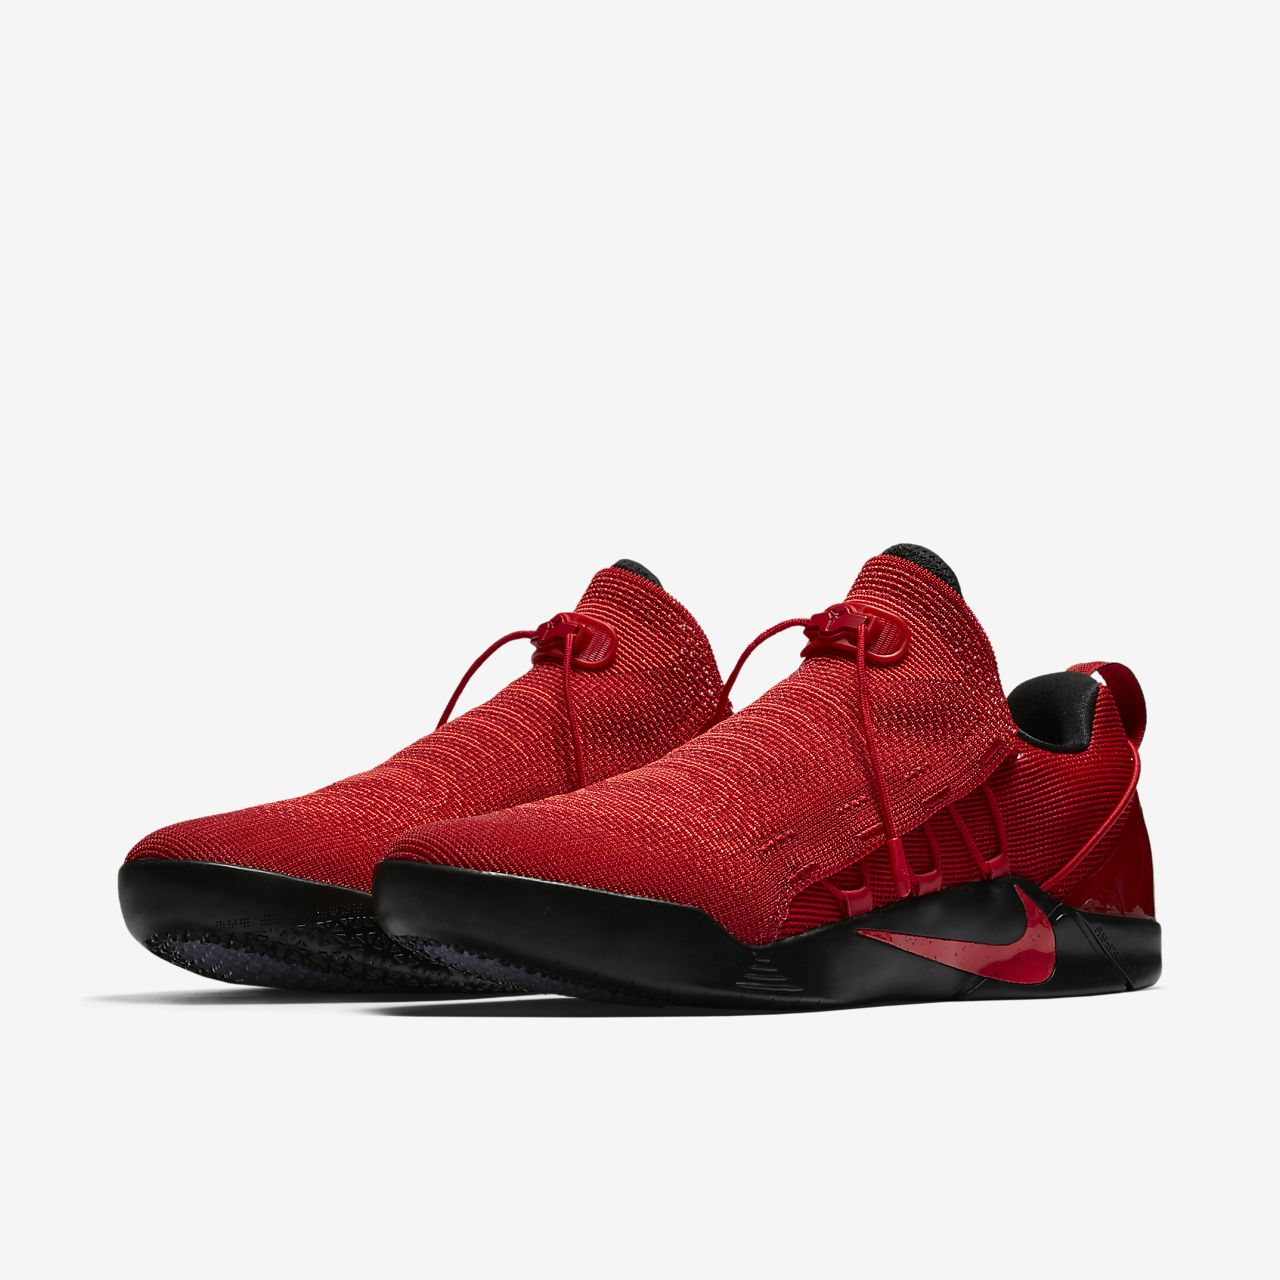 premium selection cf8e2 29e90 nike kobe a.d. nxt university red release date  kobe a.d. nxt basketball  shoe